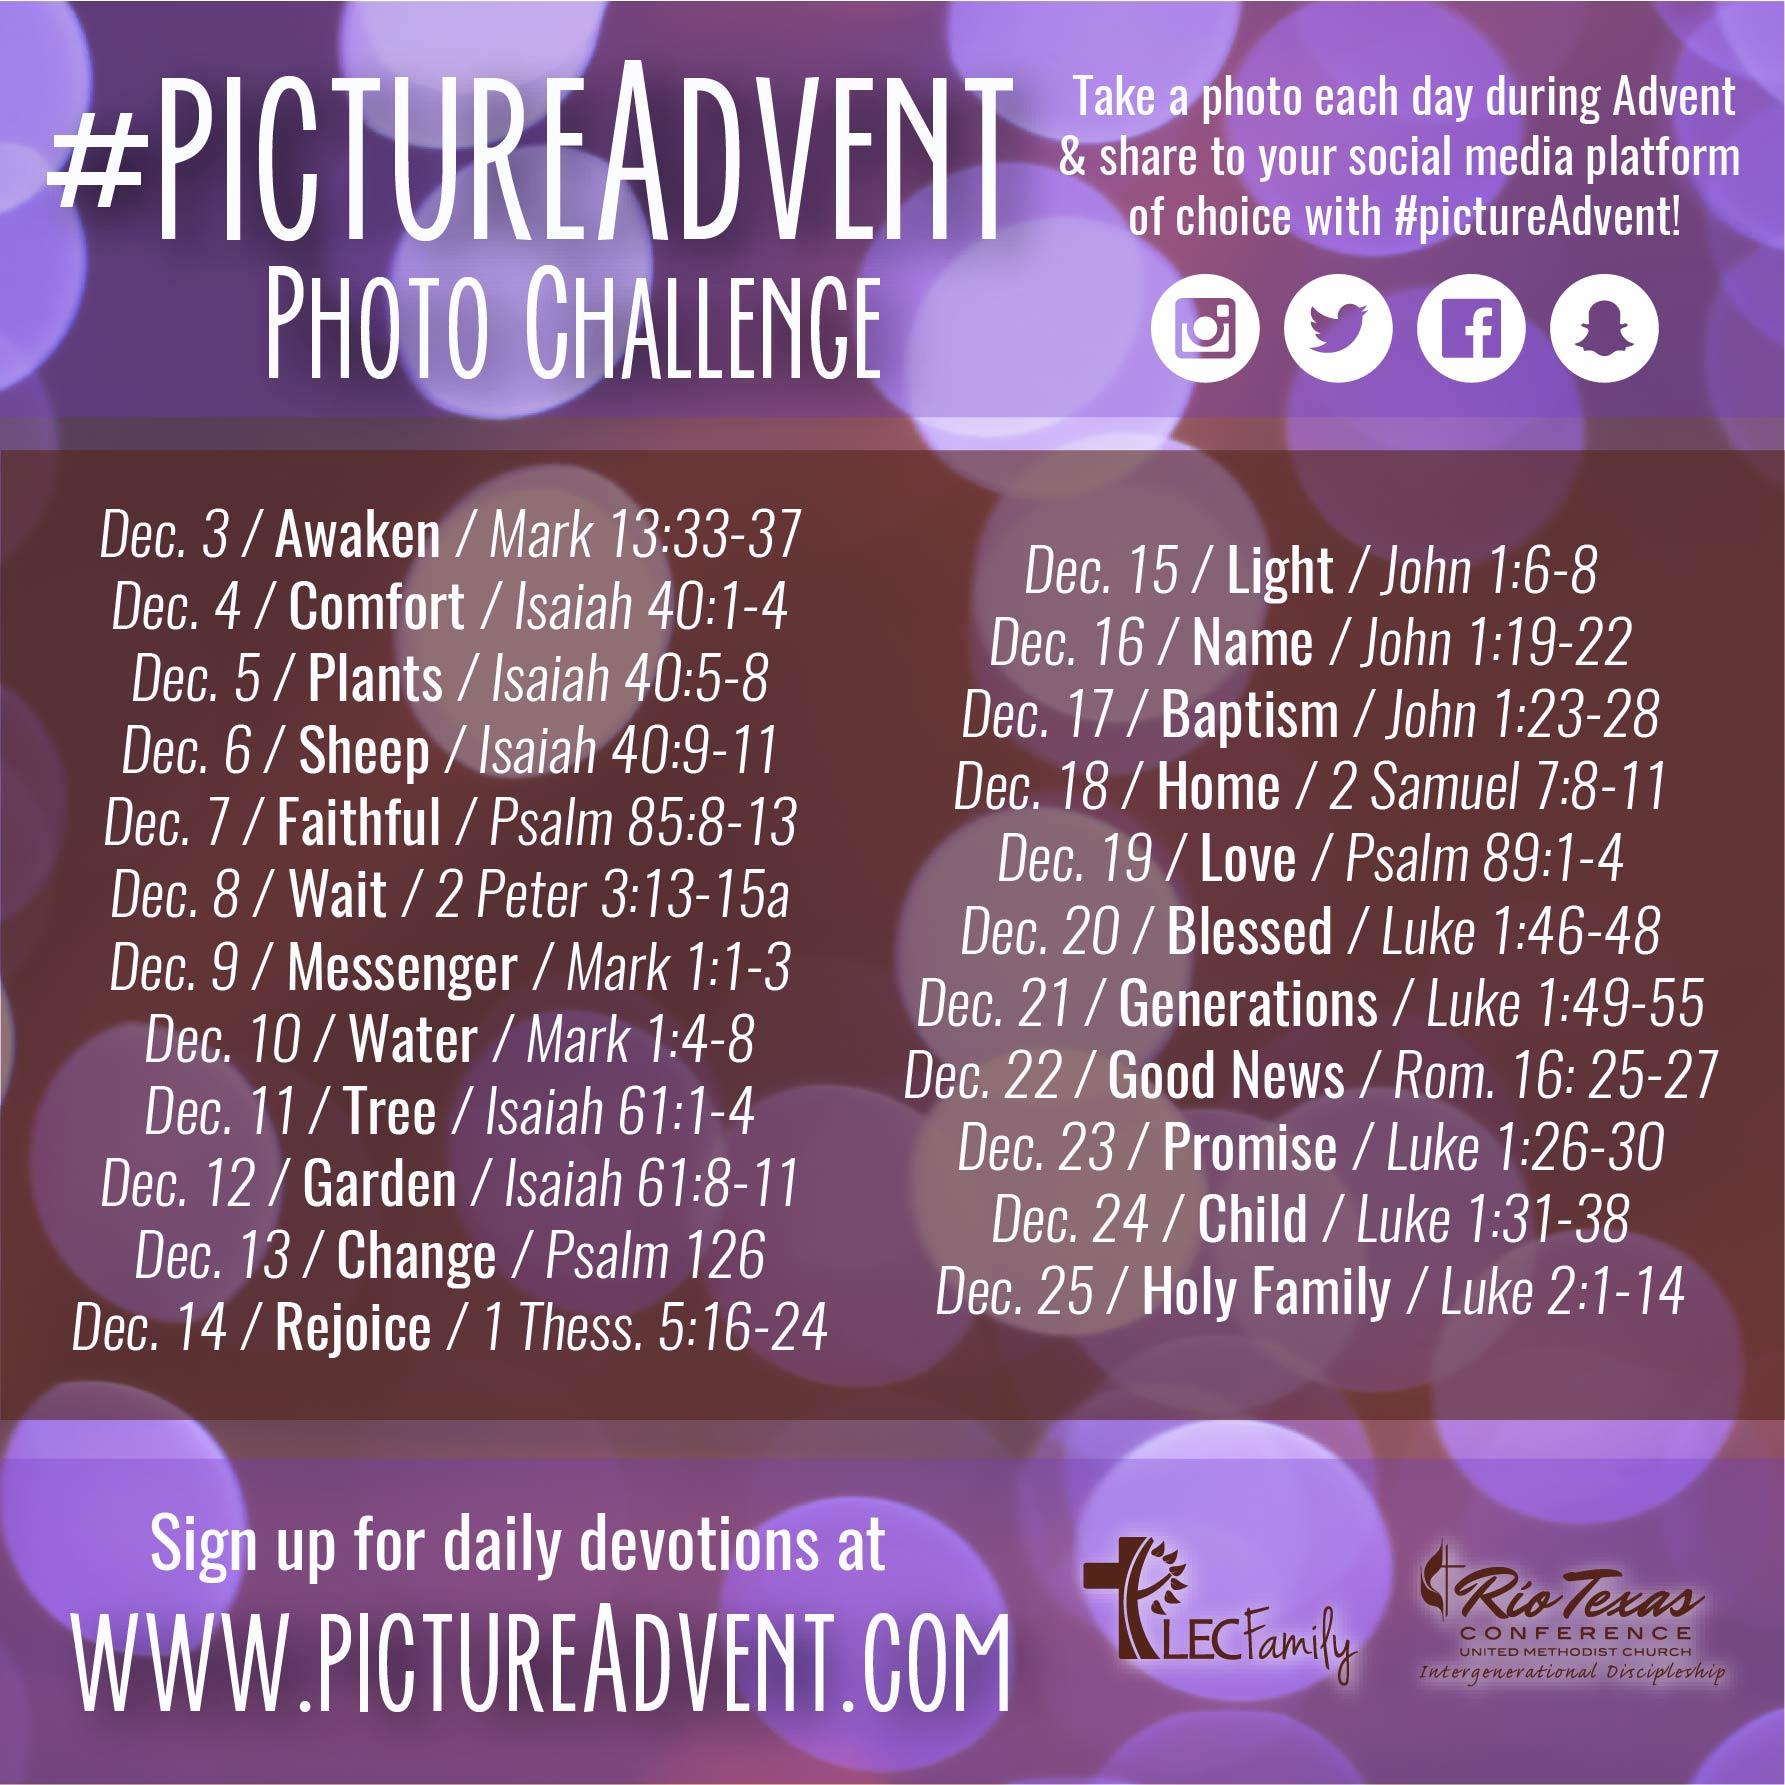 #pictureAdvent 2017 Photo Challenge Graphic-01.jpg